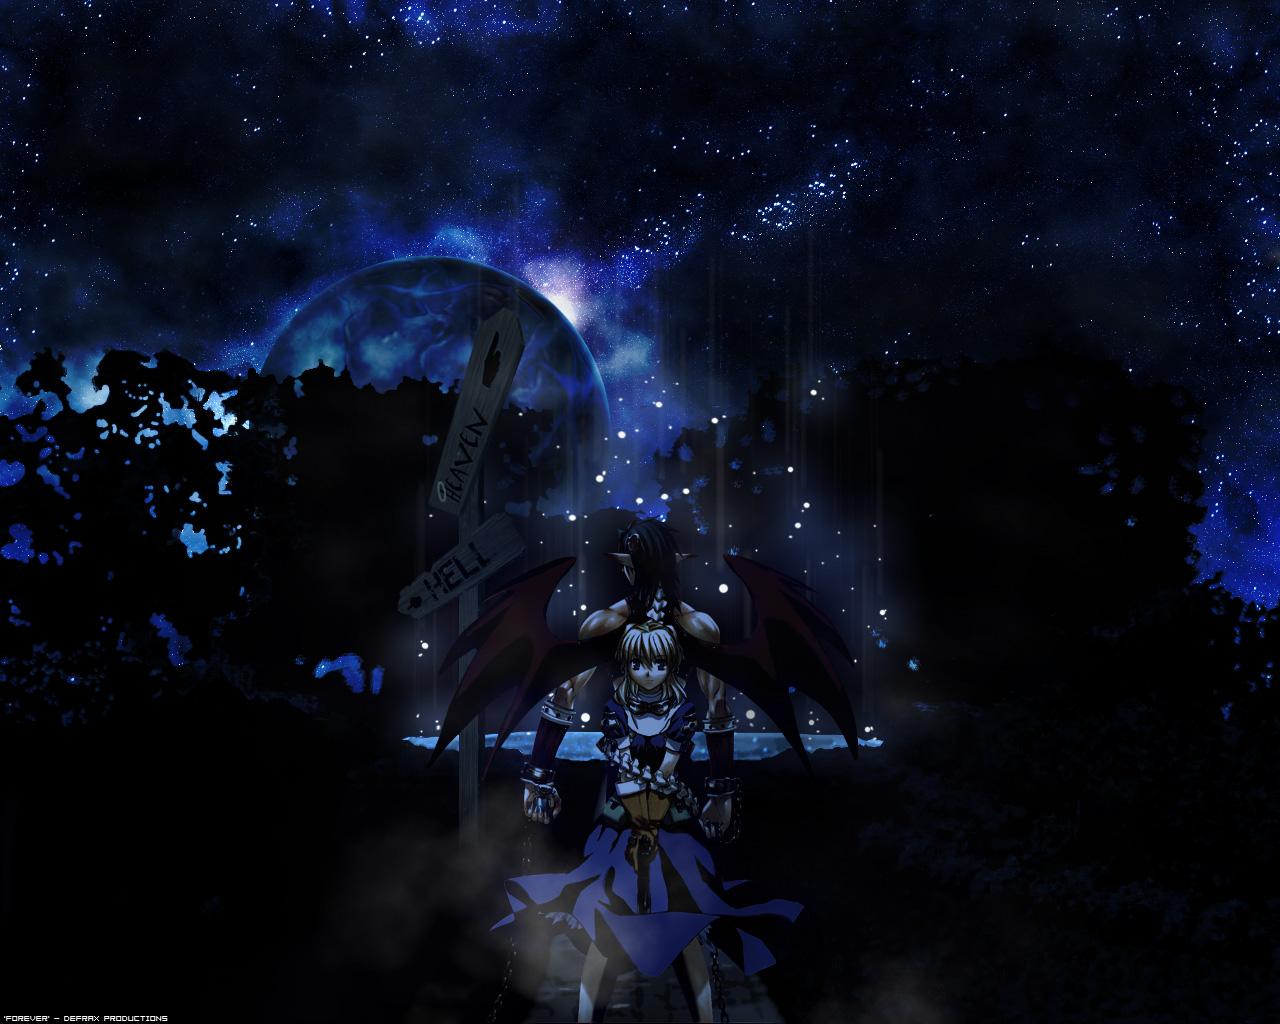 chrno chrono_crusade dark gun night nun pointed_ears rosette_christopher stars weapon wings